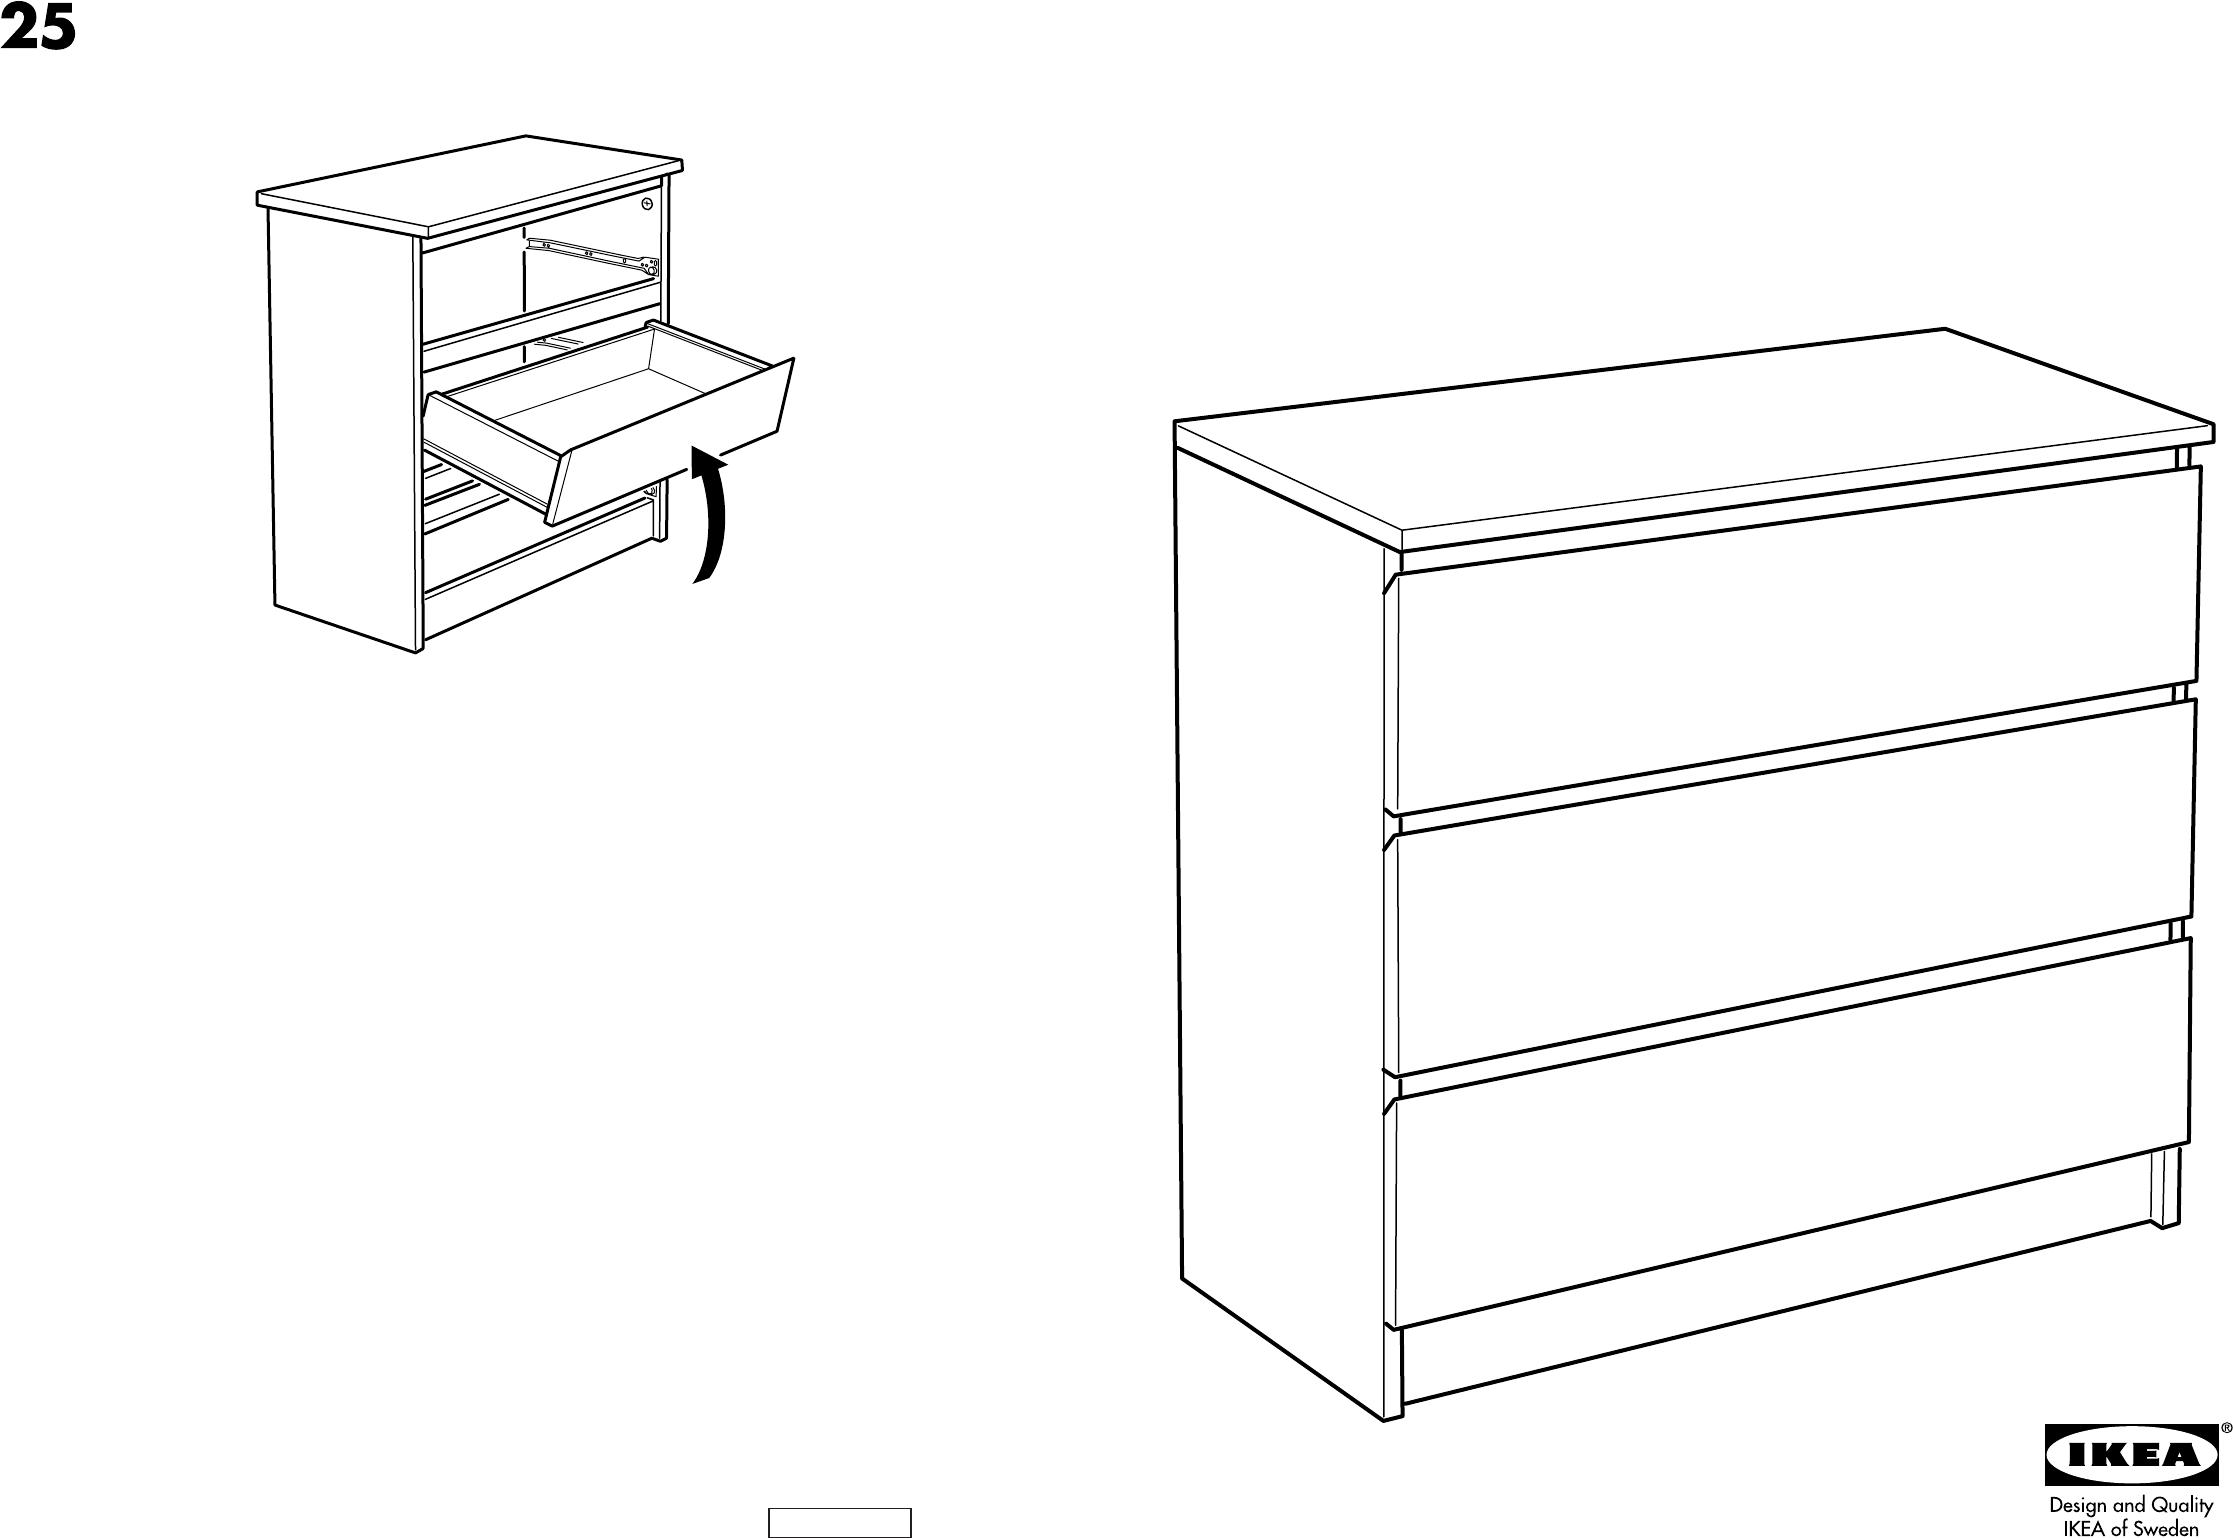 Ikea Malm Ladekast Handleiding.Handleiding Ikea Malm Ladekast 3 Pagina 1 Van 8 Dansk